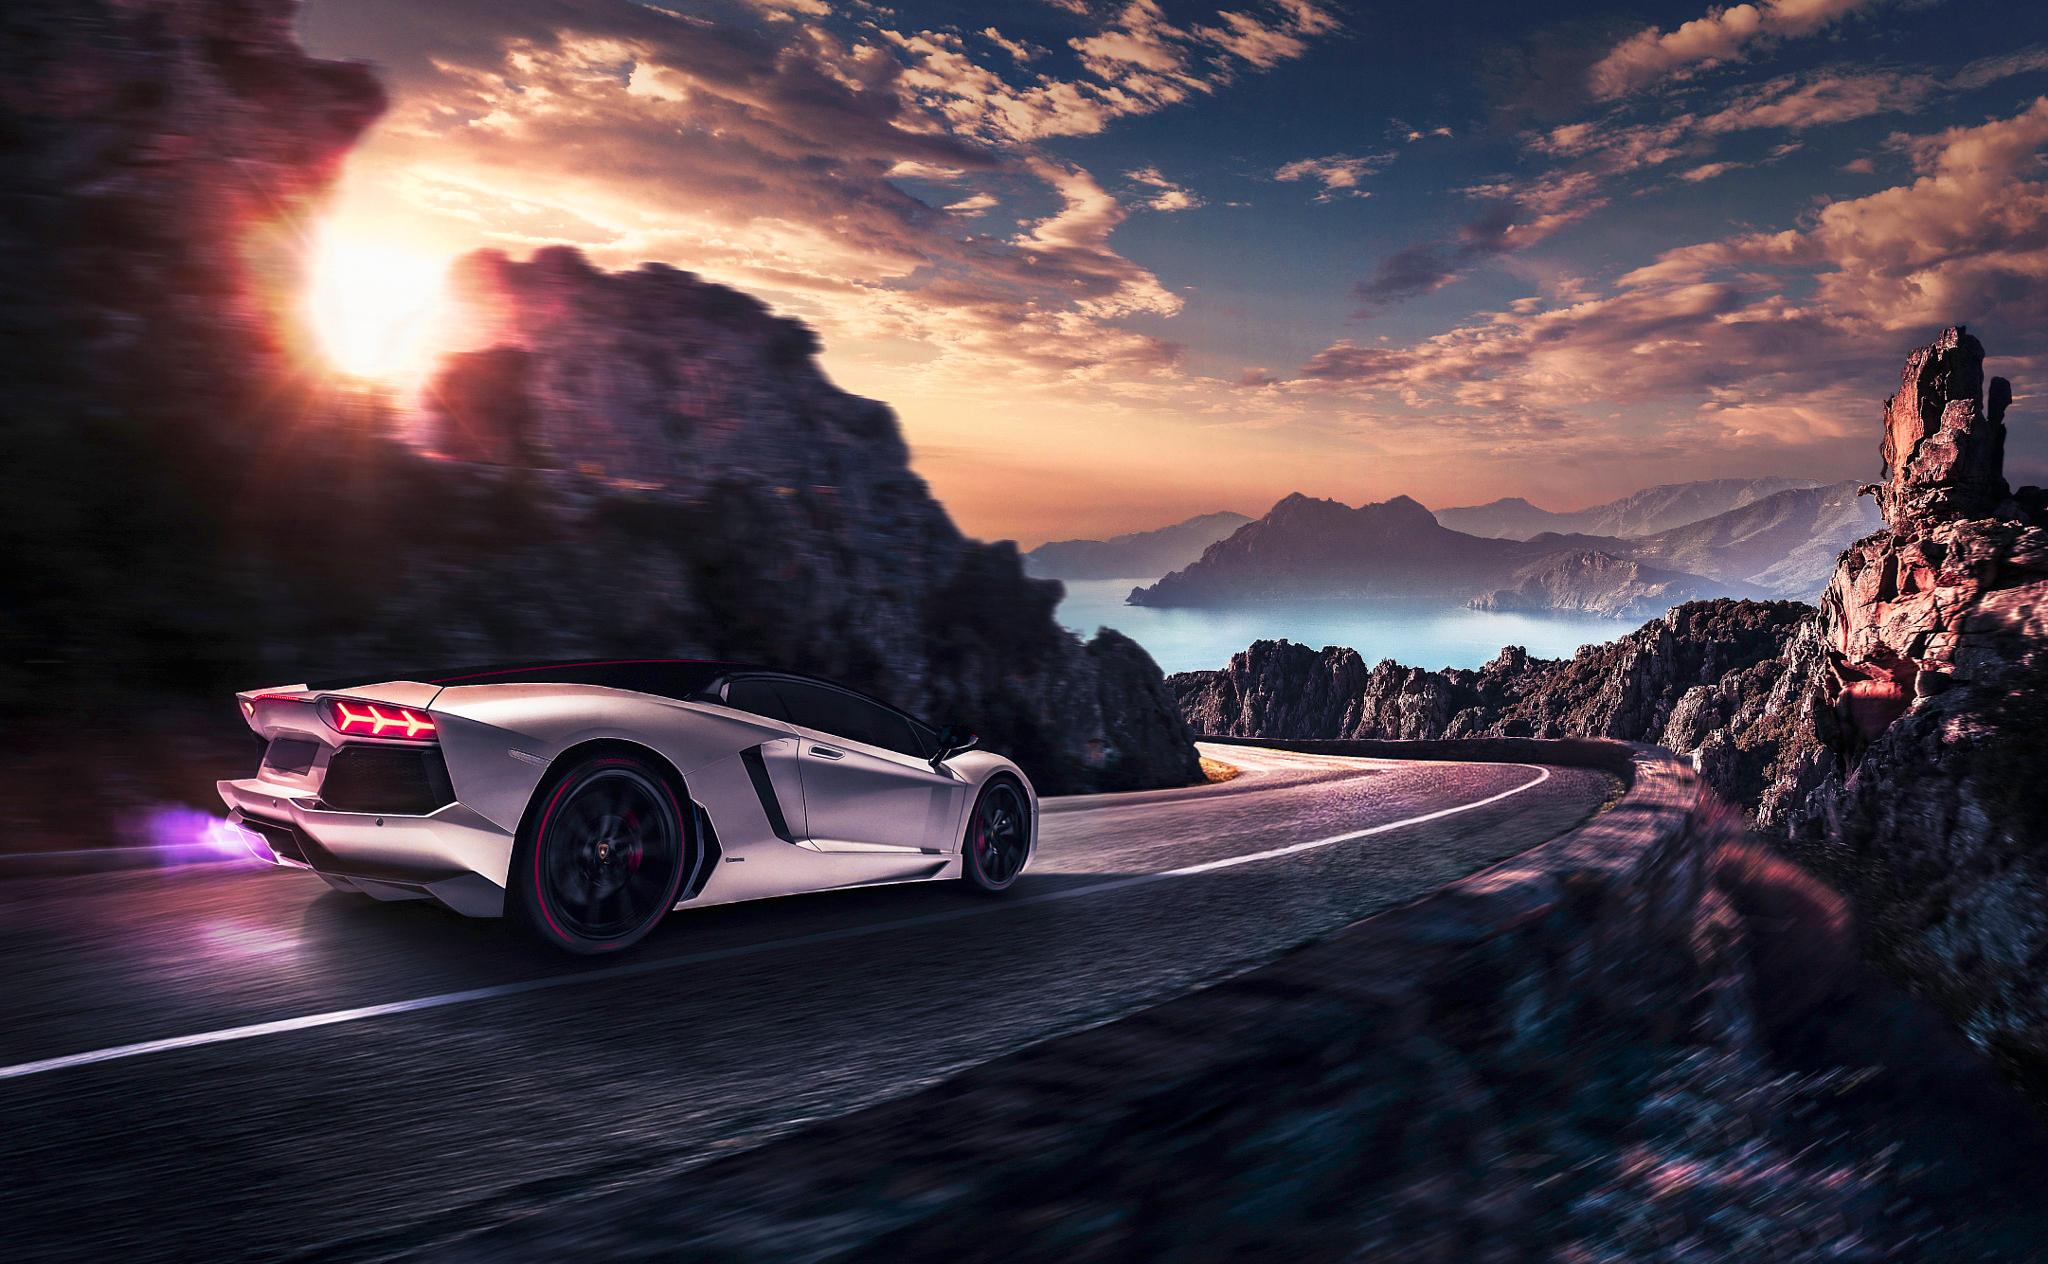 Lamborghini Aventador LP 700-4 HD Wallpaper | Background ...